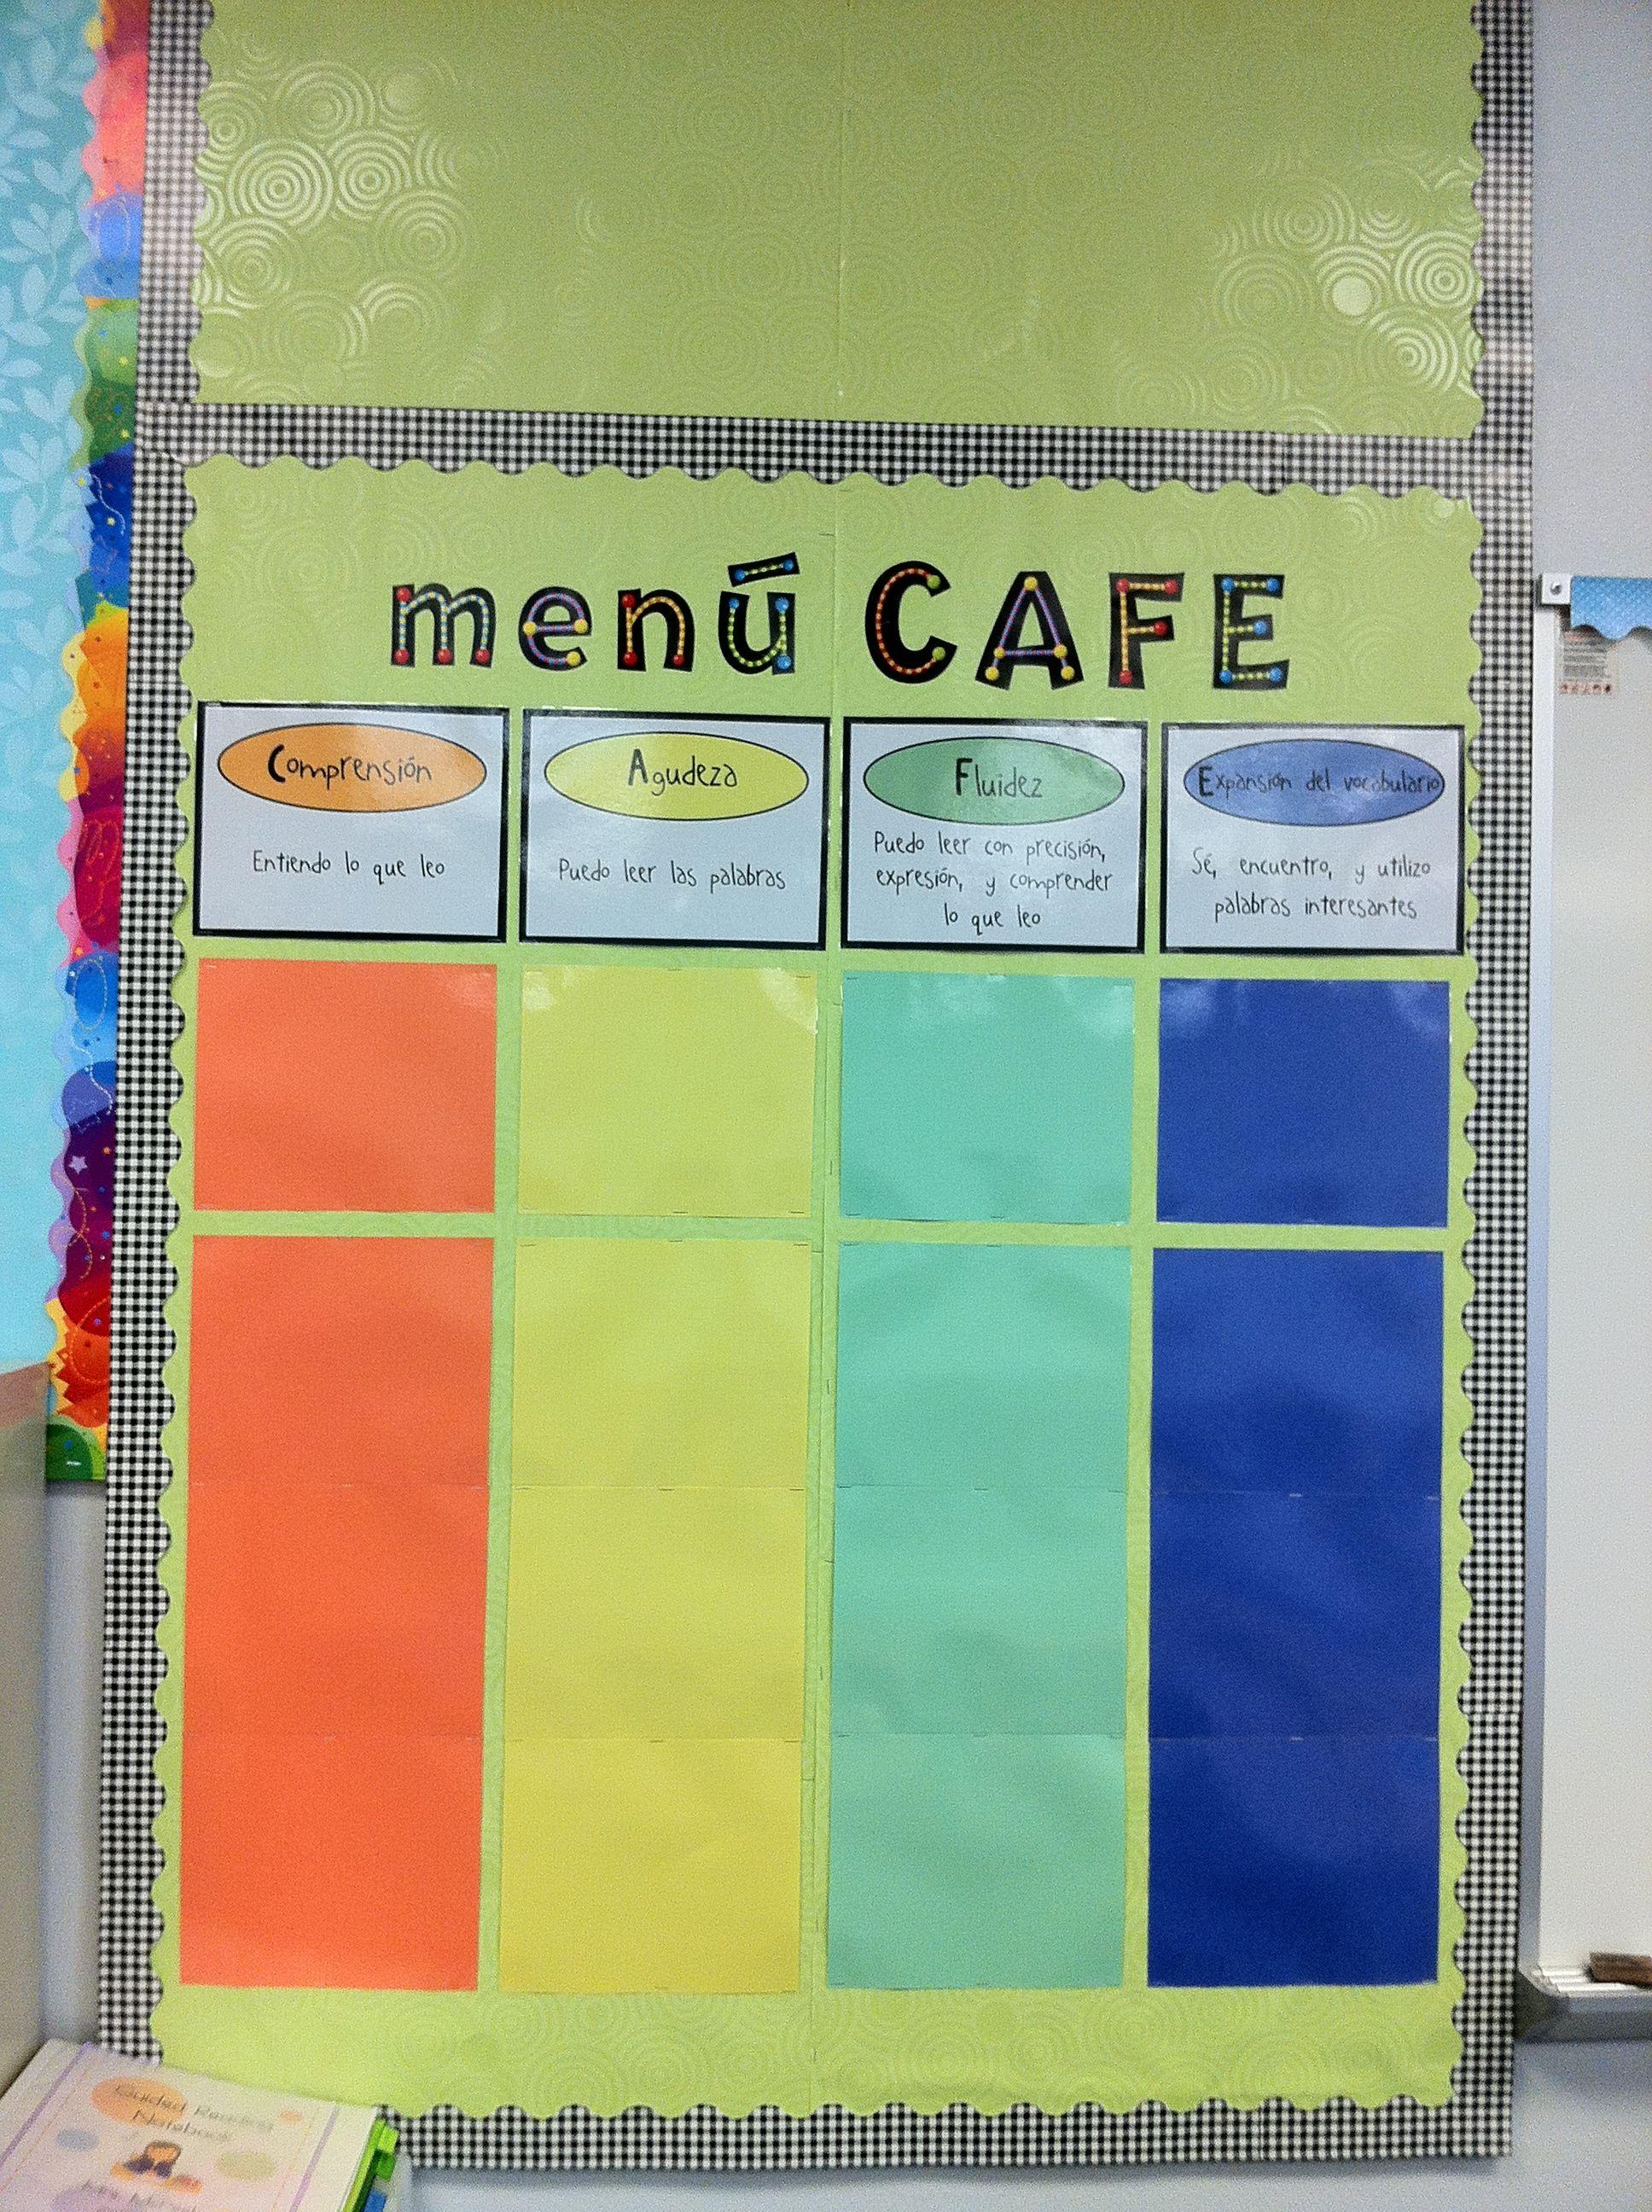 Spanish Cafe Menu Daily 5